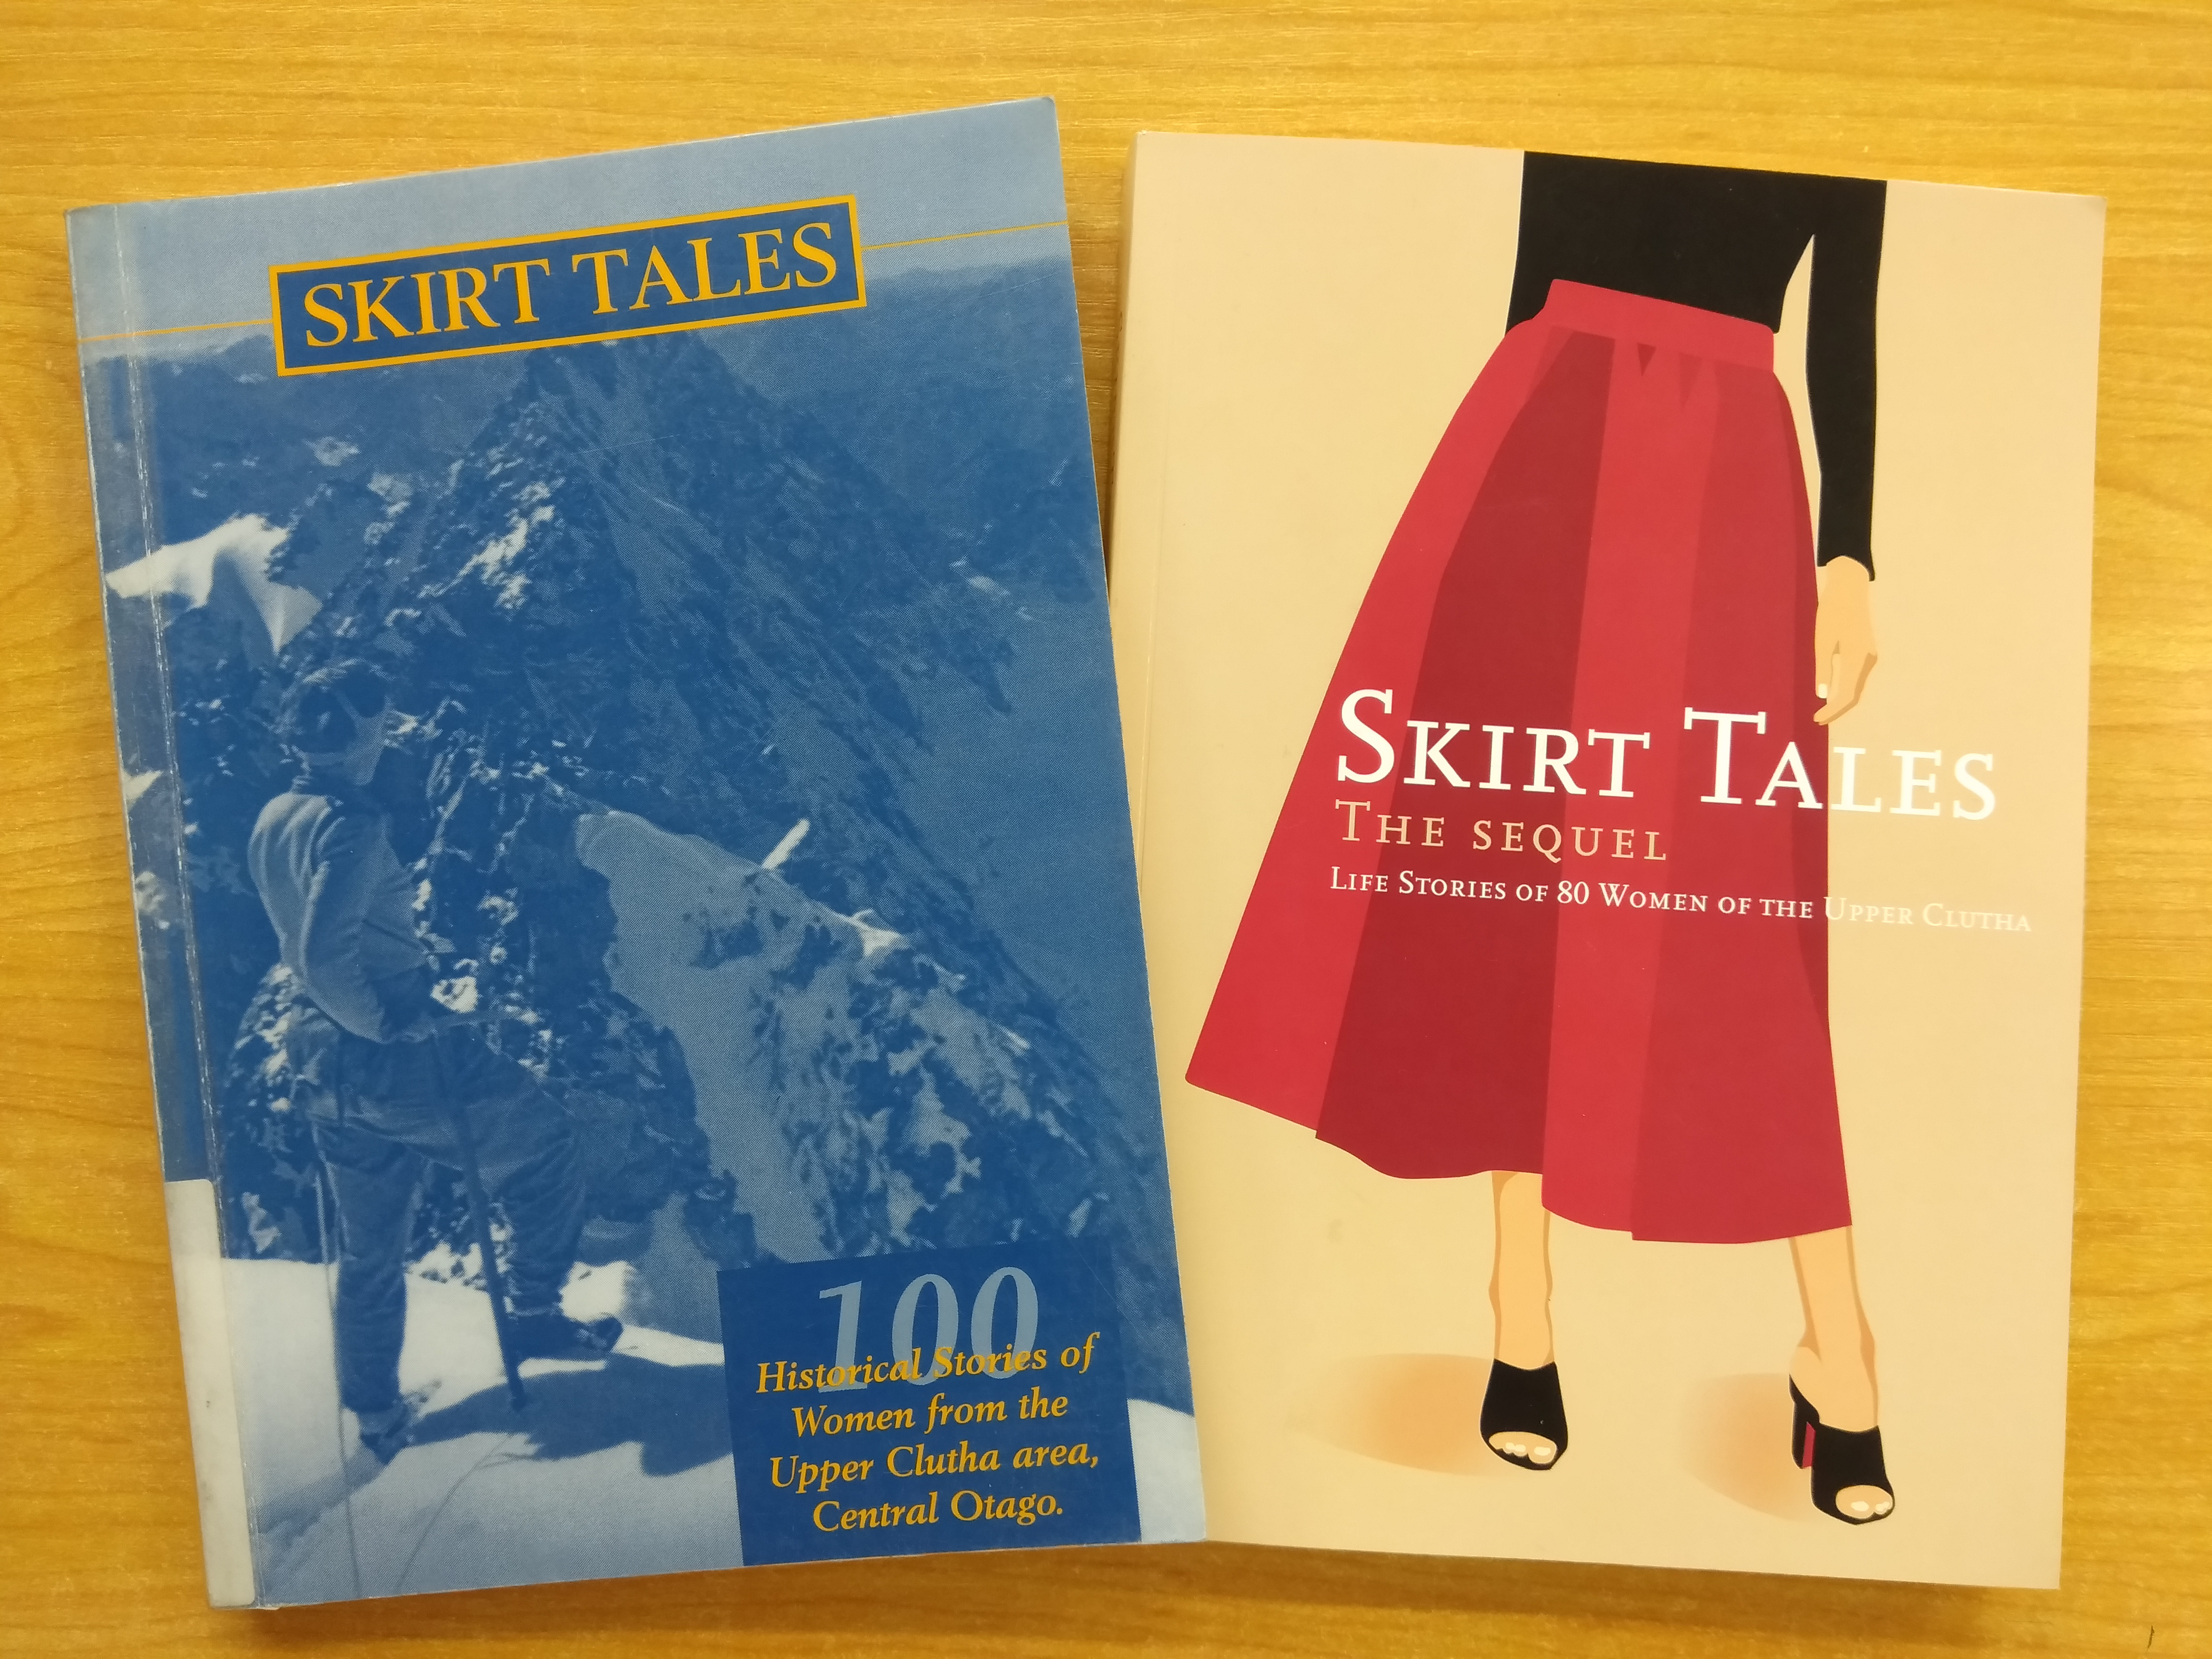 Skirt Tales